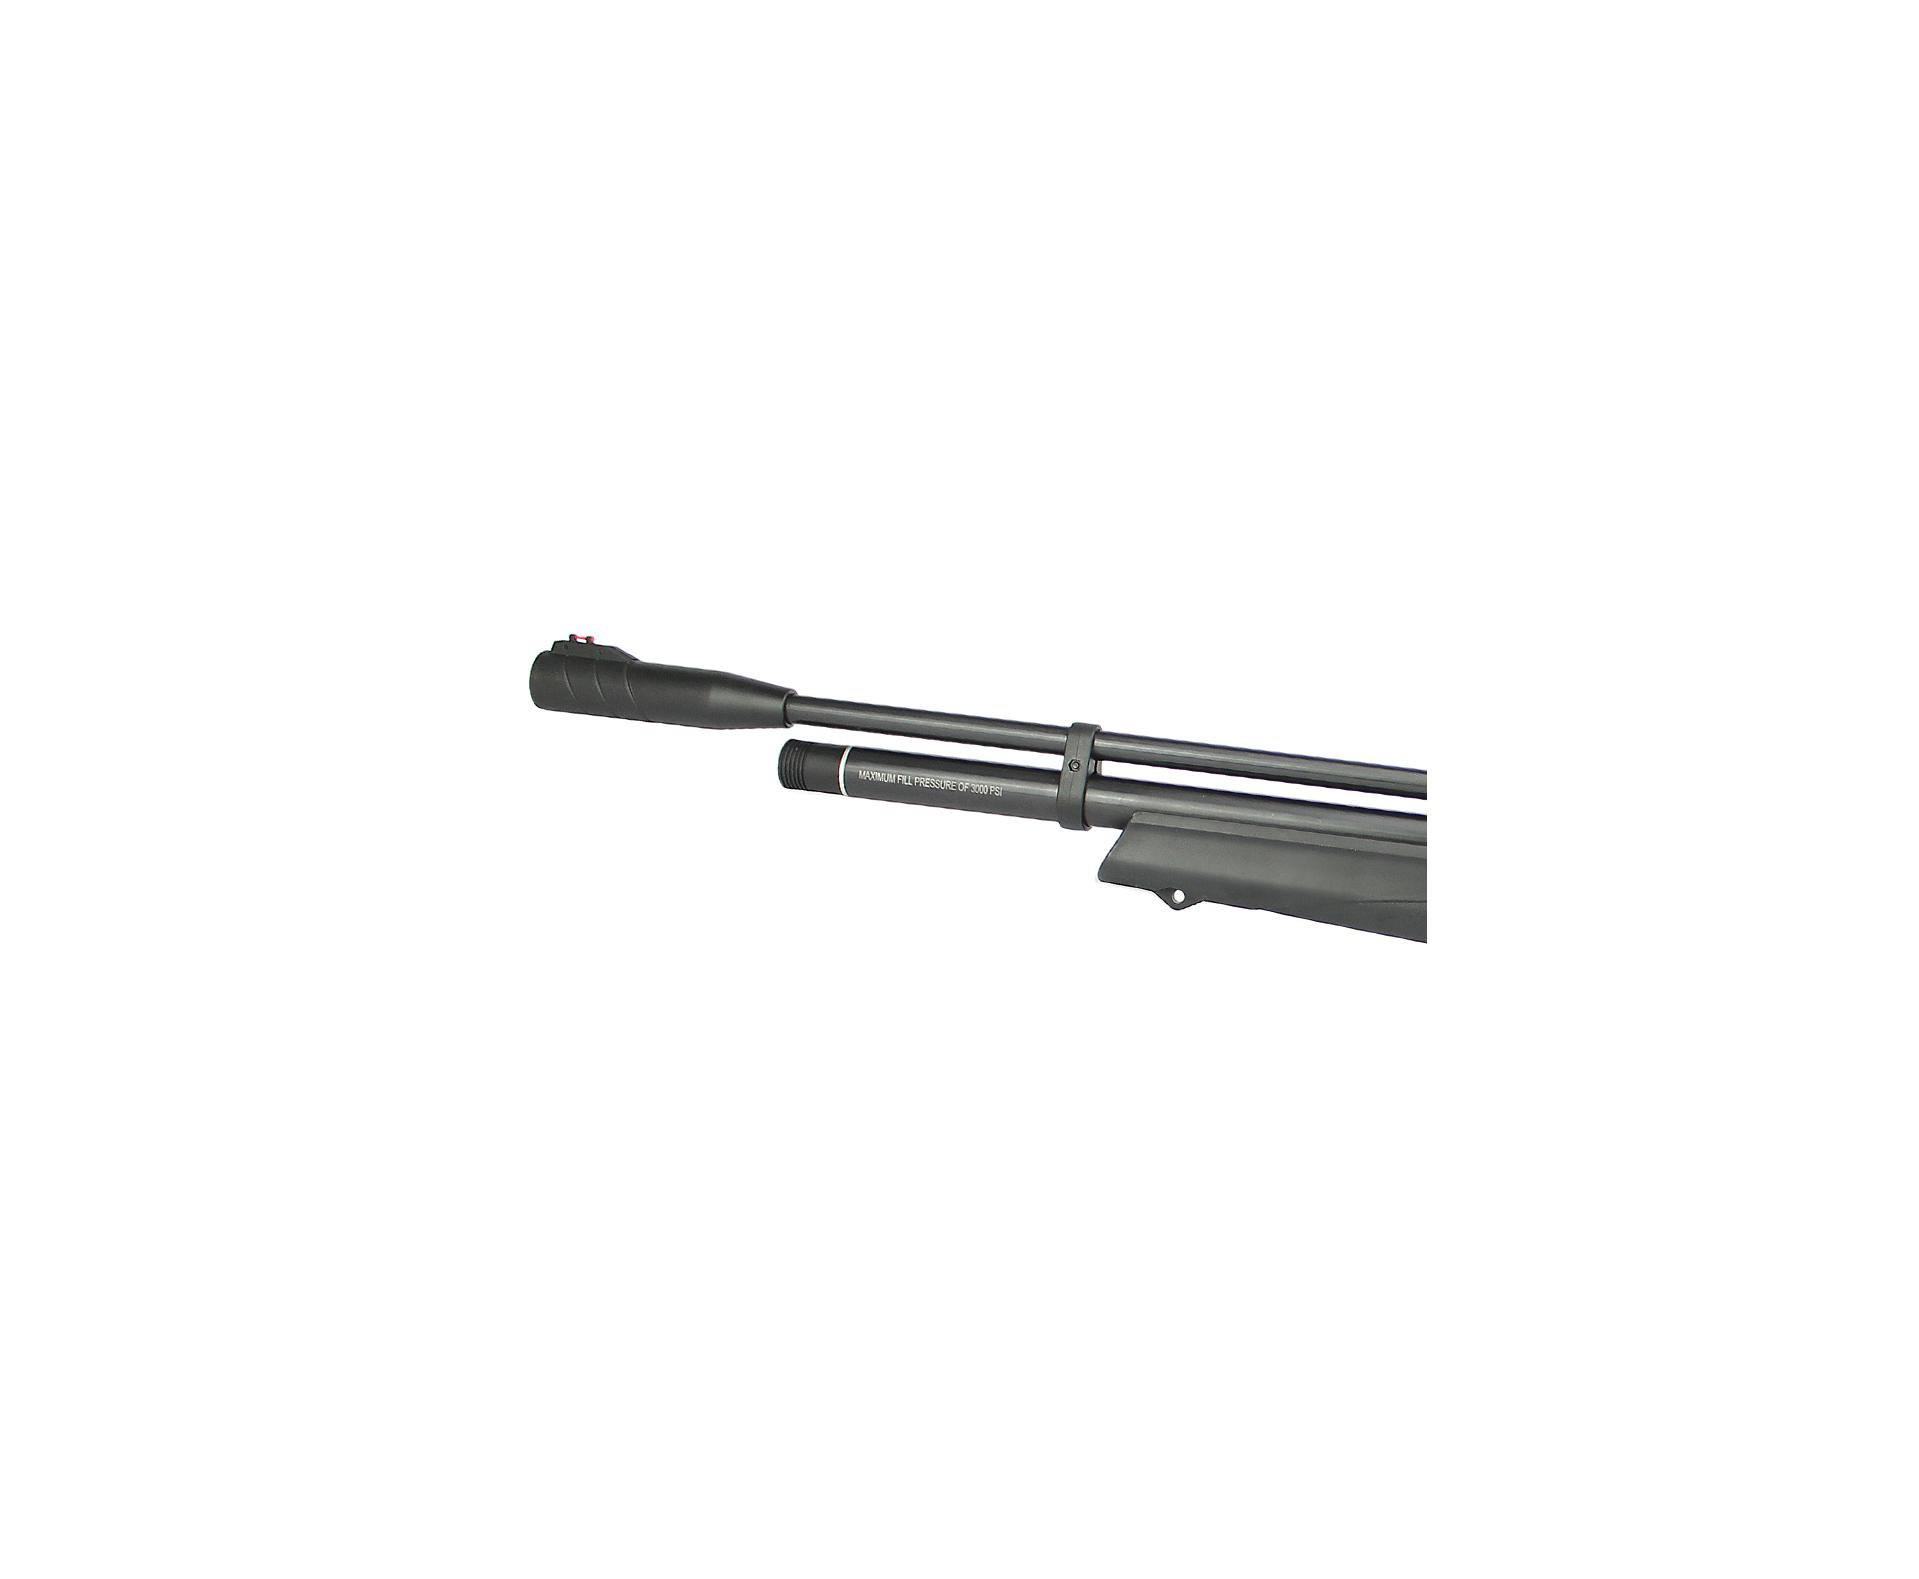 Carabina Pcp Beeman 1336 Qb Chief Polimero 10 Tiros 5,5mm - Rossi